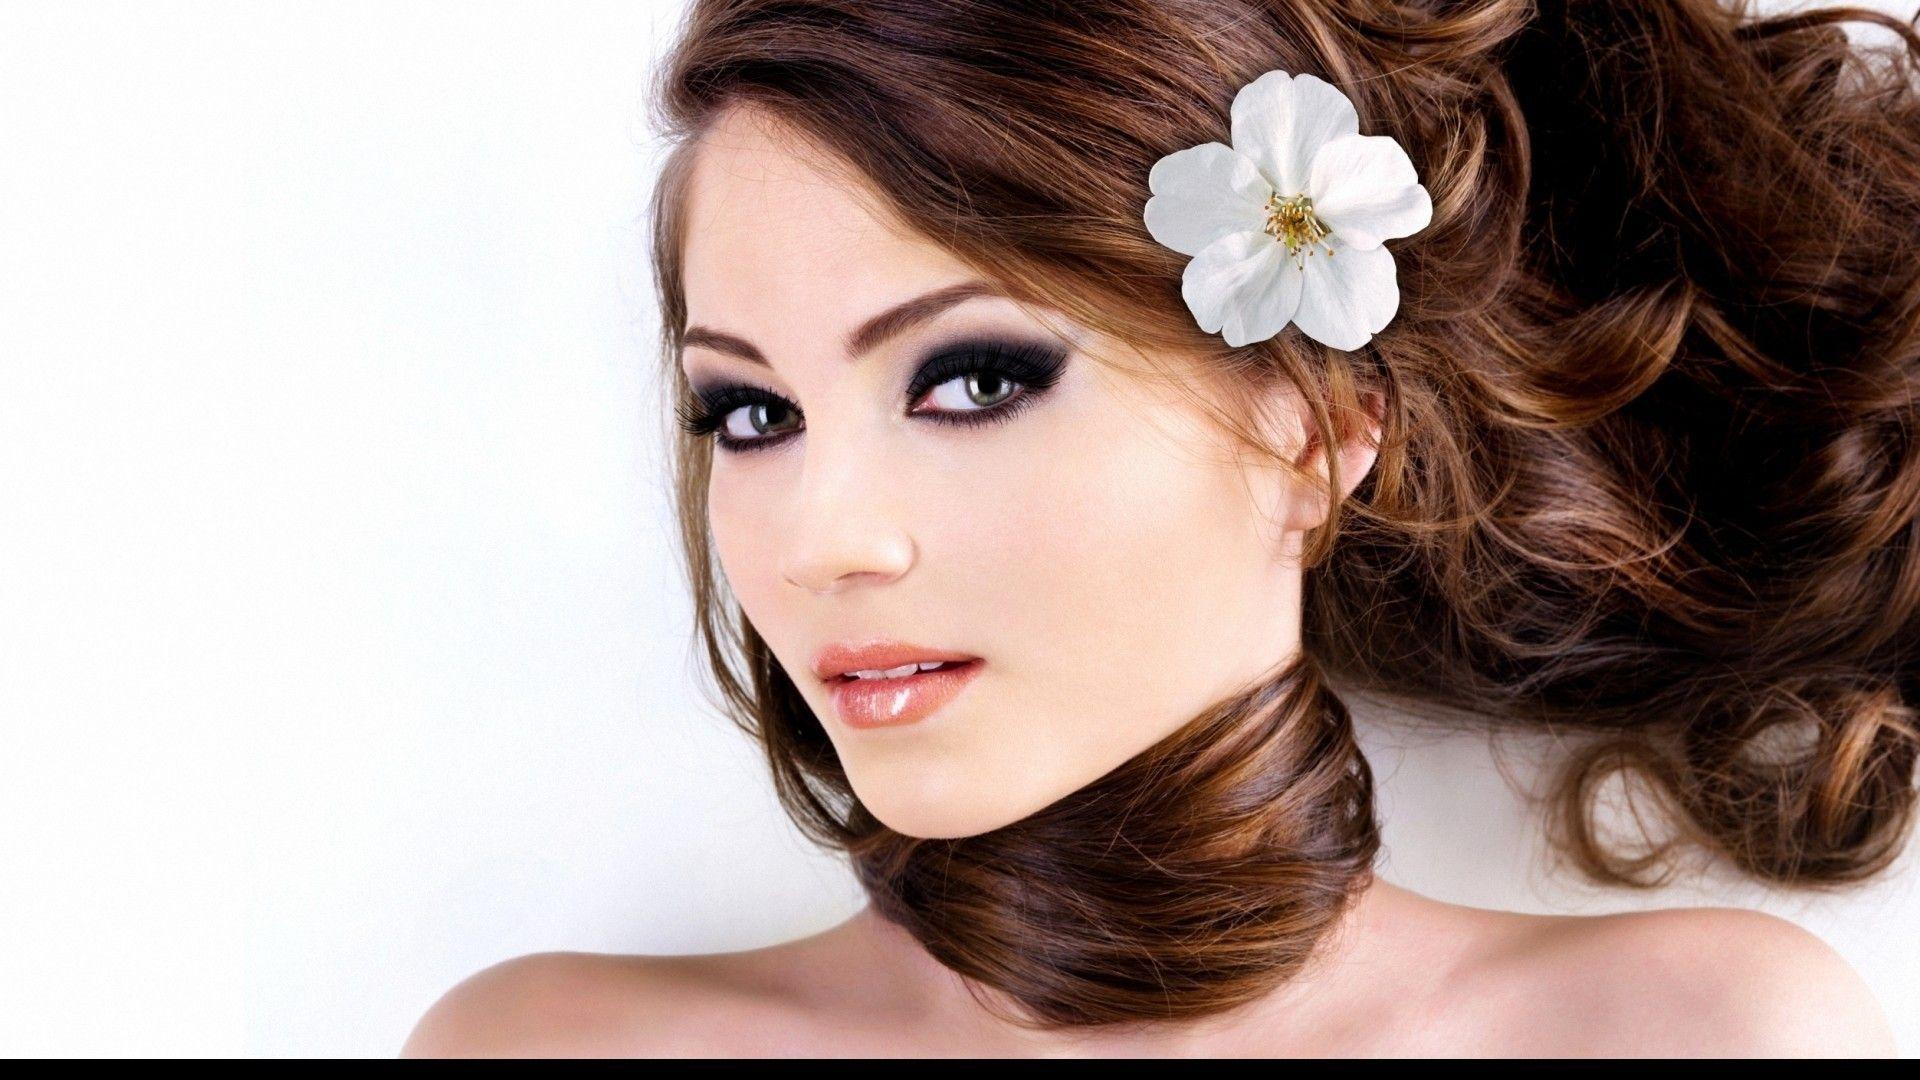 Beautiful Cute Girl Wallpaper - Model With Flower In Hair , HD Wallpaper & Backgrounds